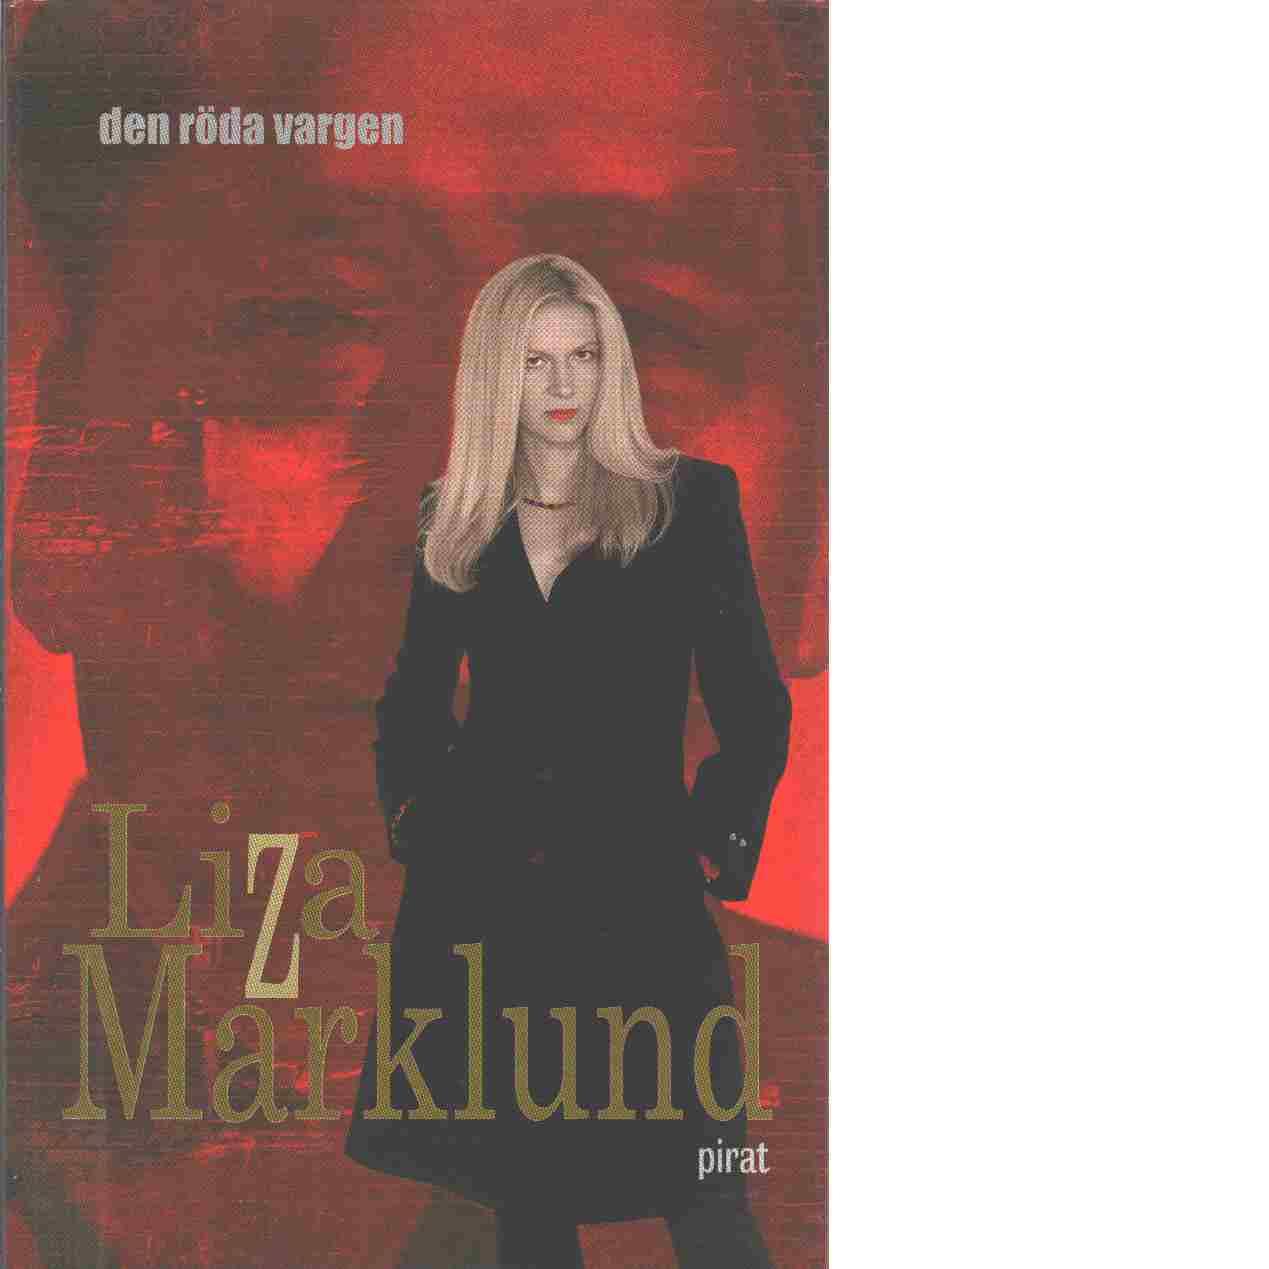 Den röda vargen - Marklund, Liza